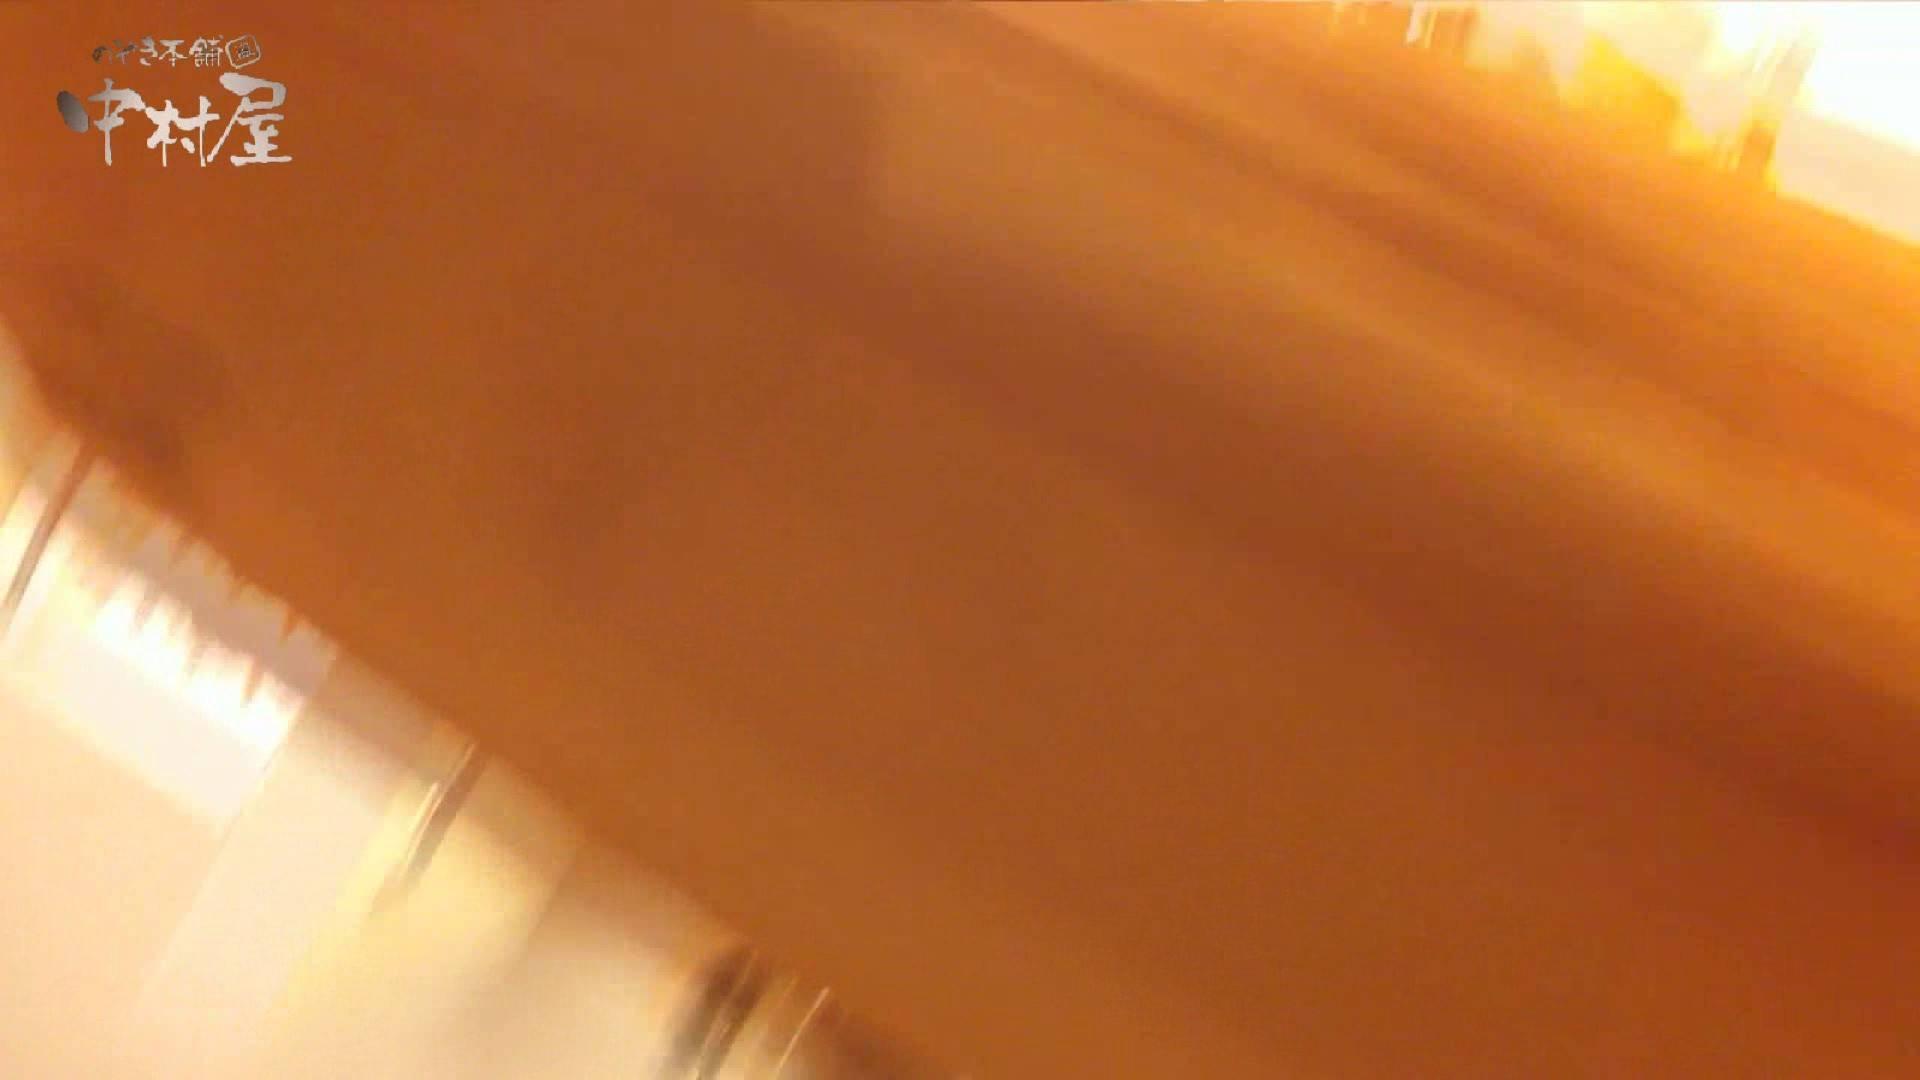 vol.84 美人アパレル胸チラ&パンチラ 帽子オネェさんに胸元アタック! 接写  94連発 9